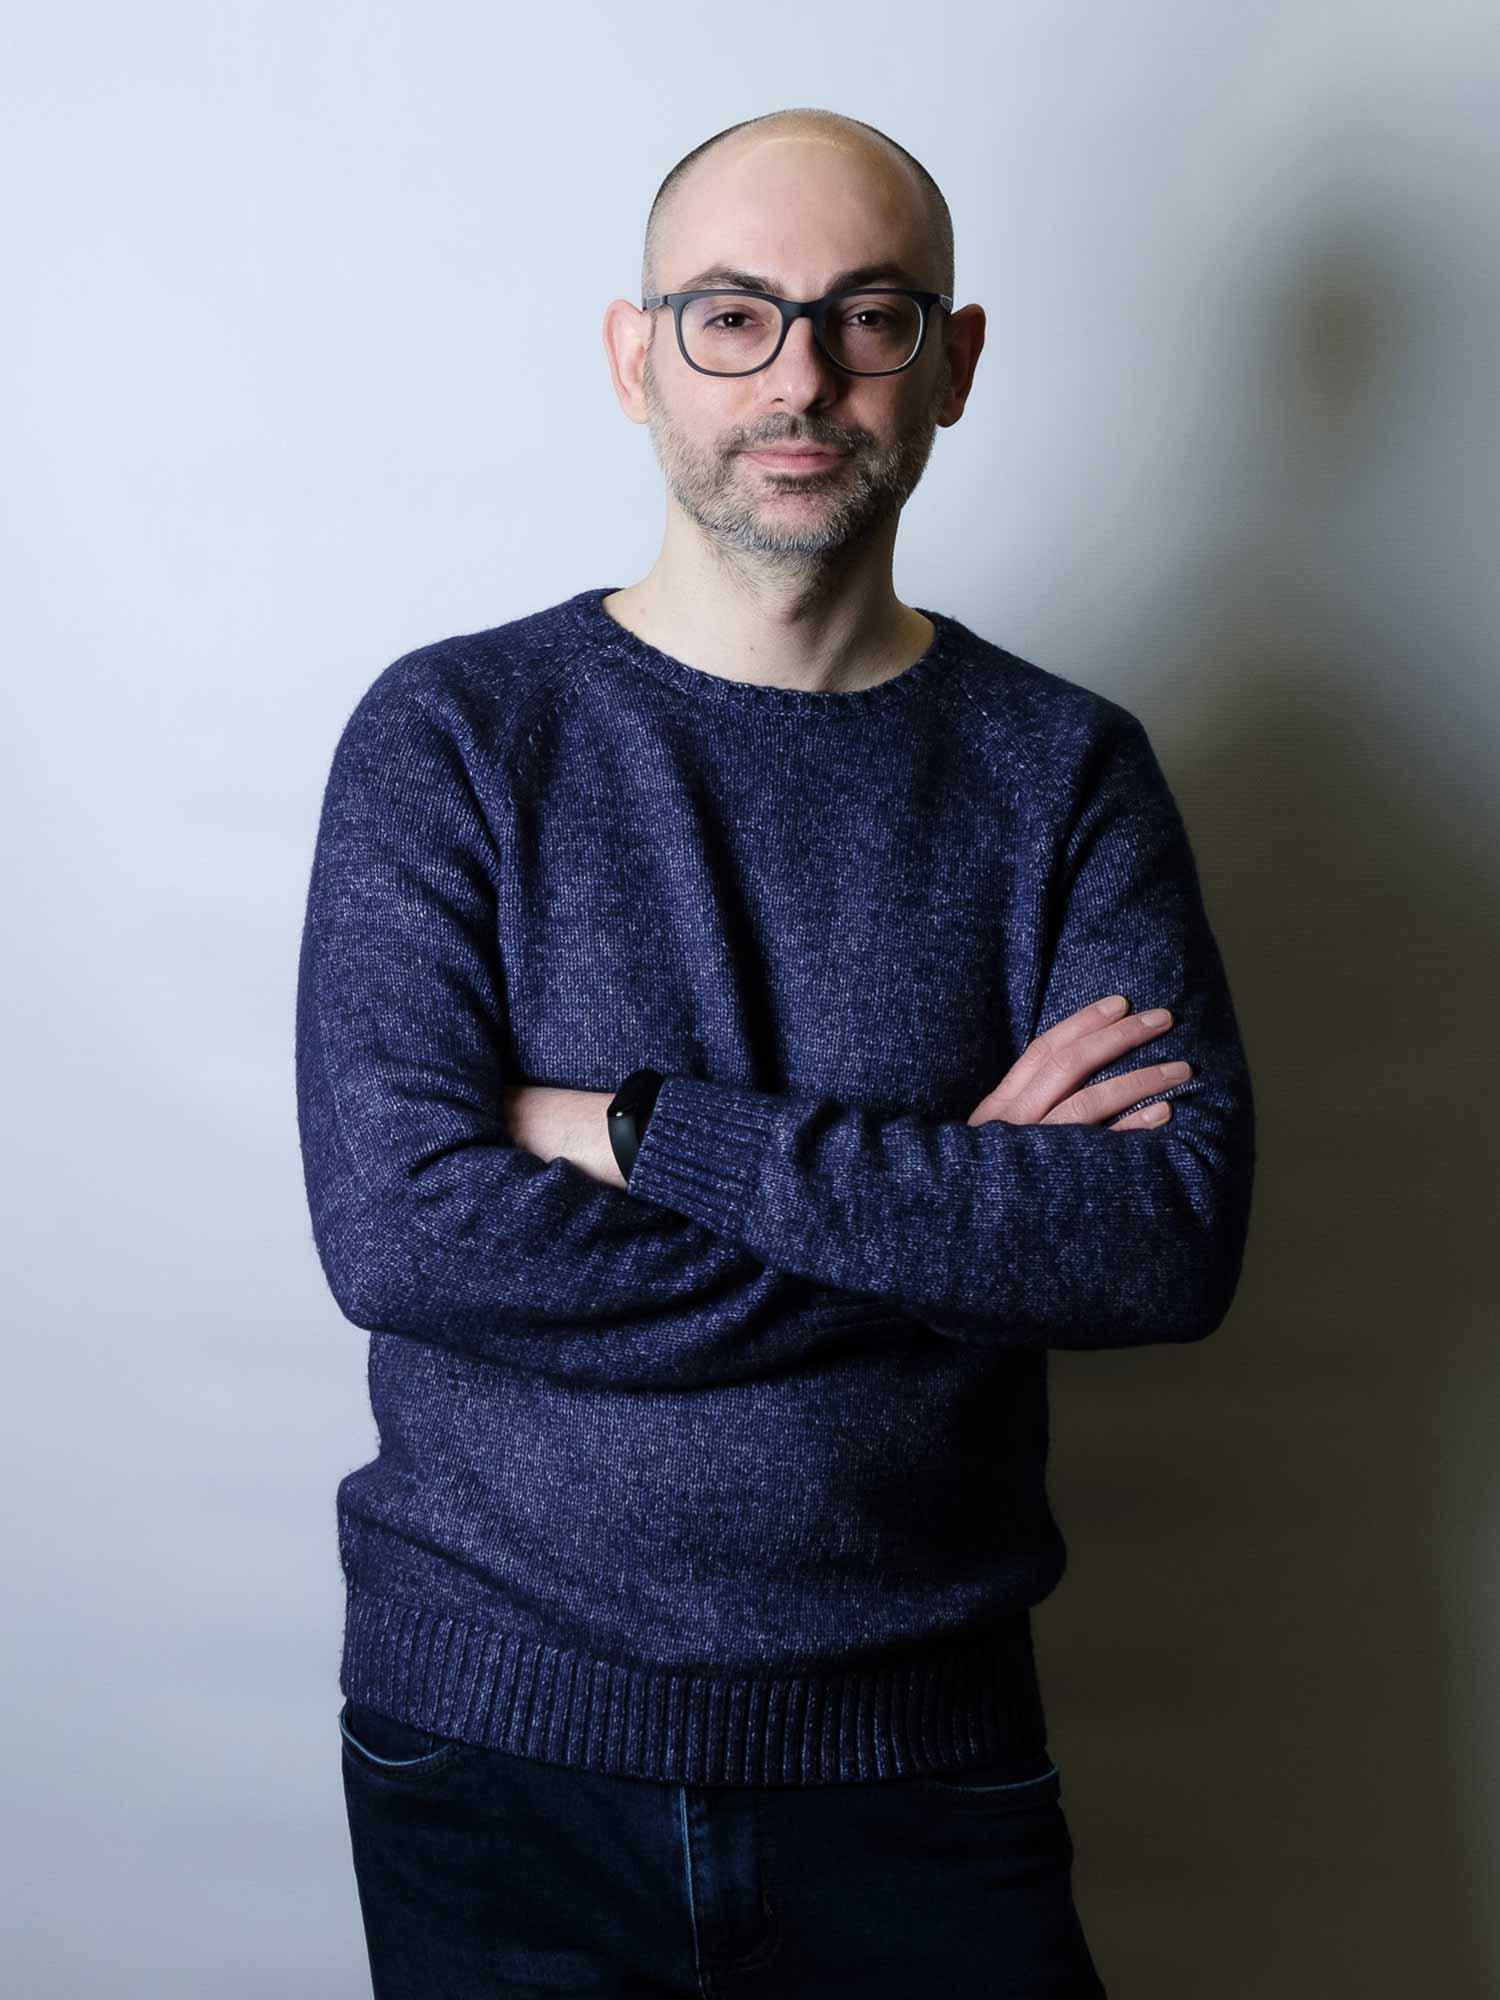 Francesco Giuntini